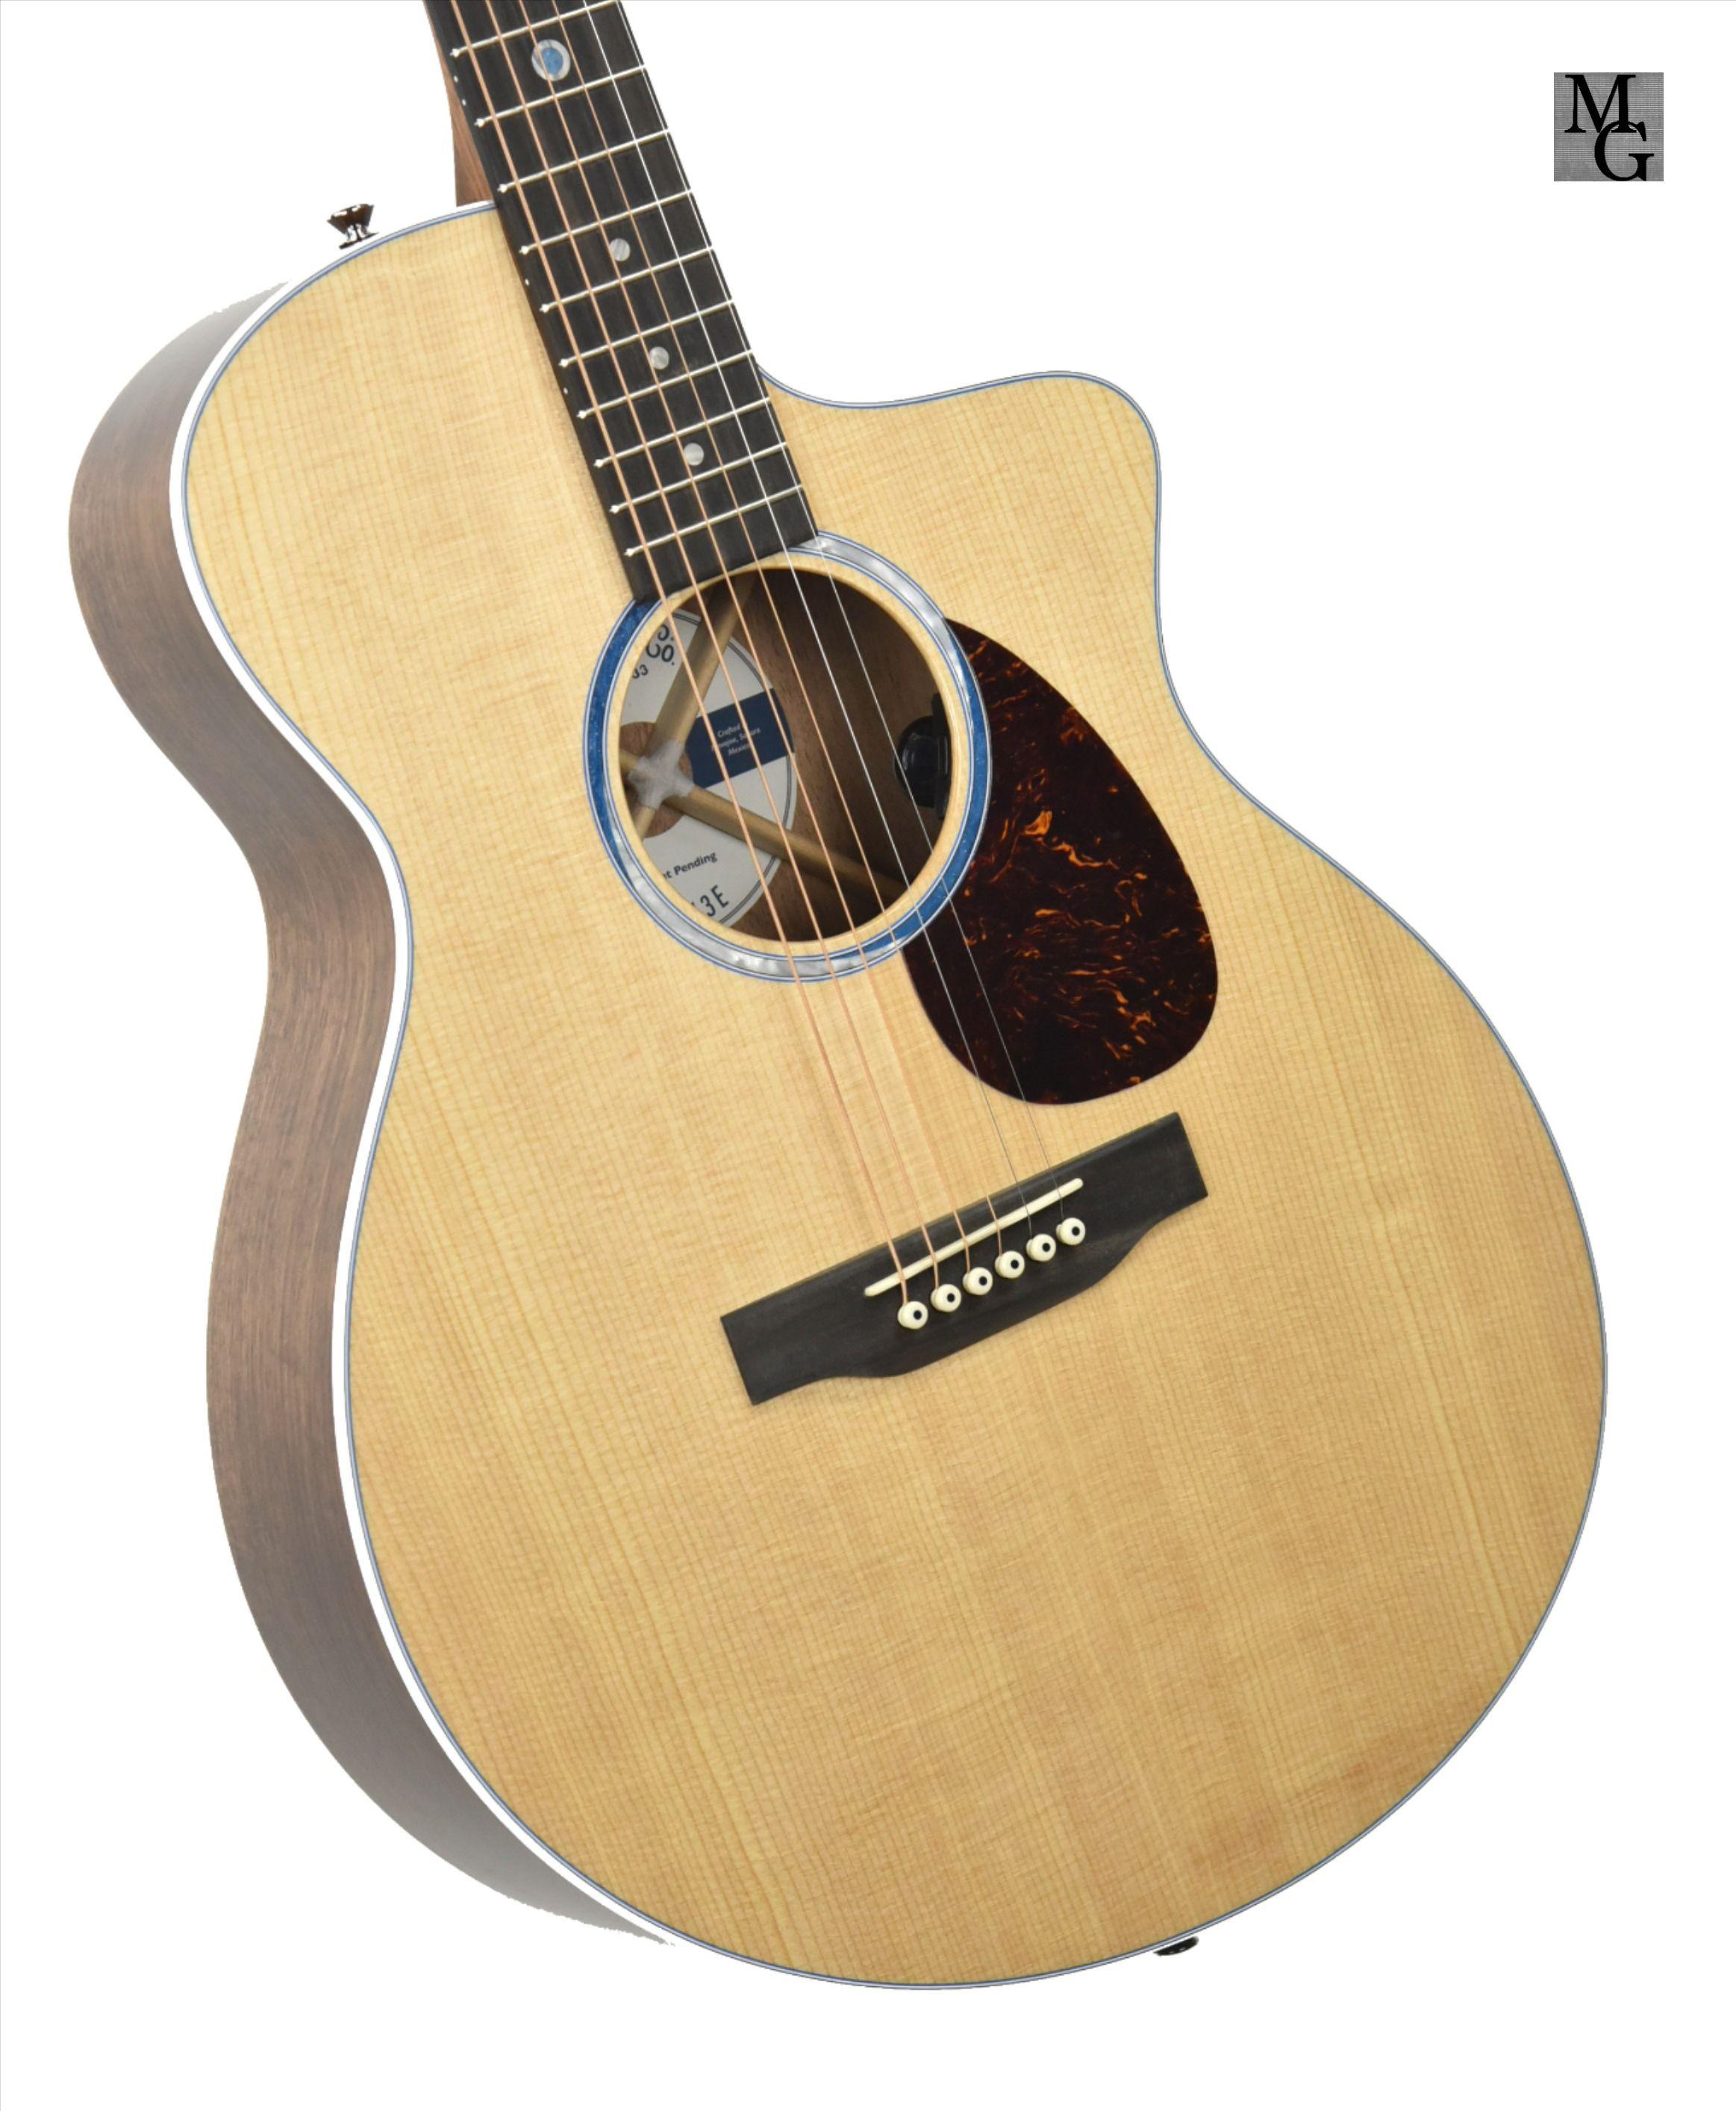 Martin Sc 13e Acoustic Electric Guitar In Natural 2396970 Acoustic Electric Acoustic Electric Guitar Guitar